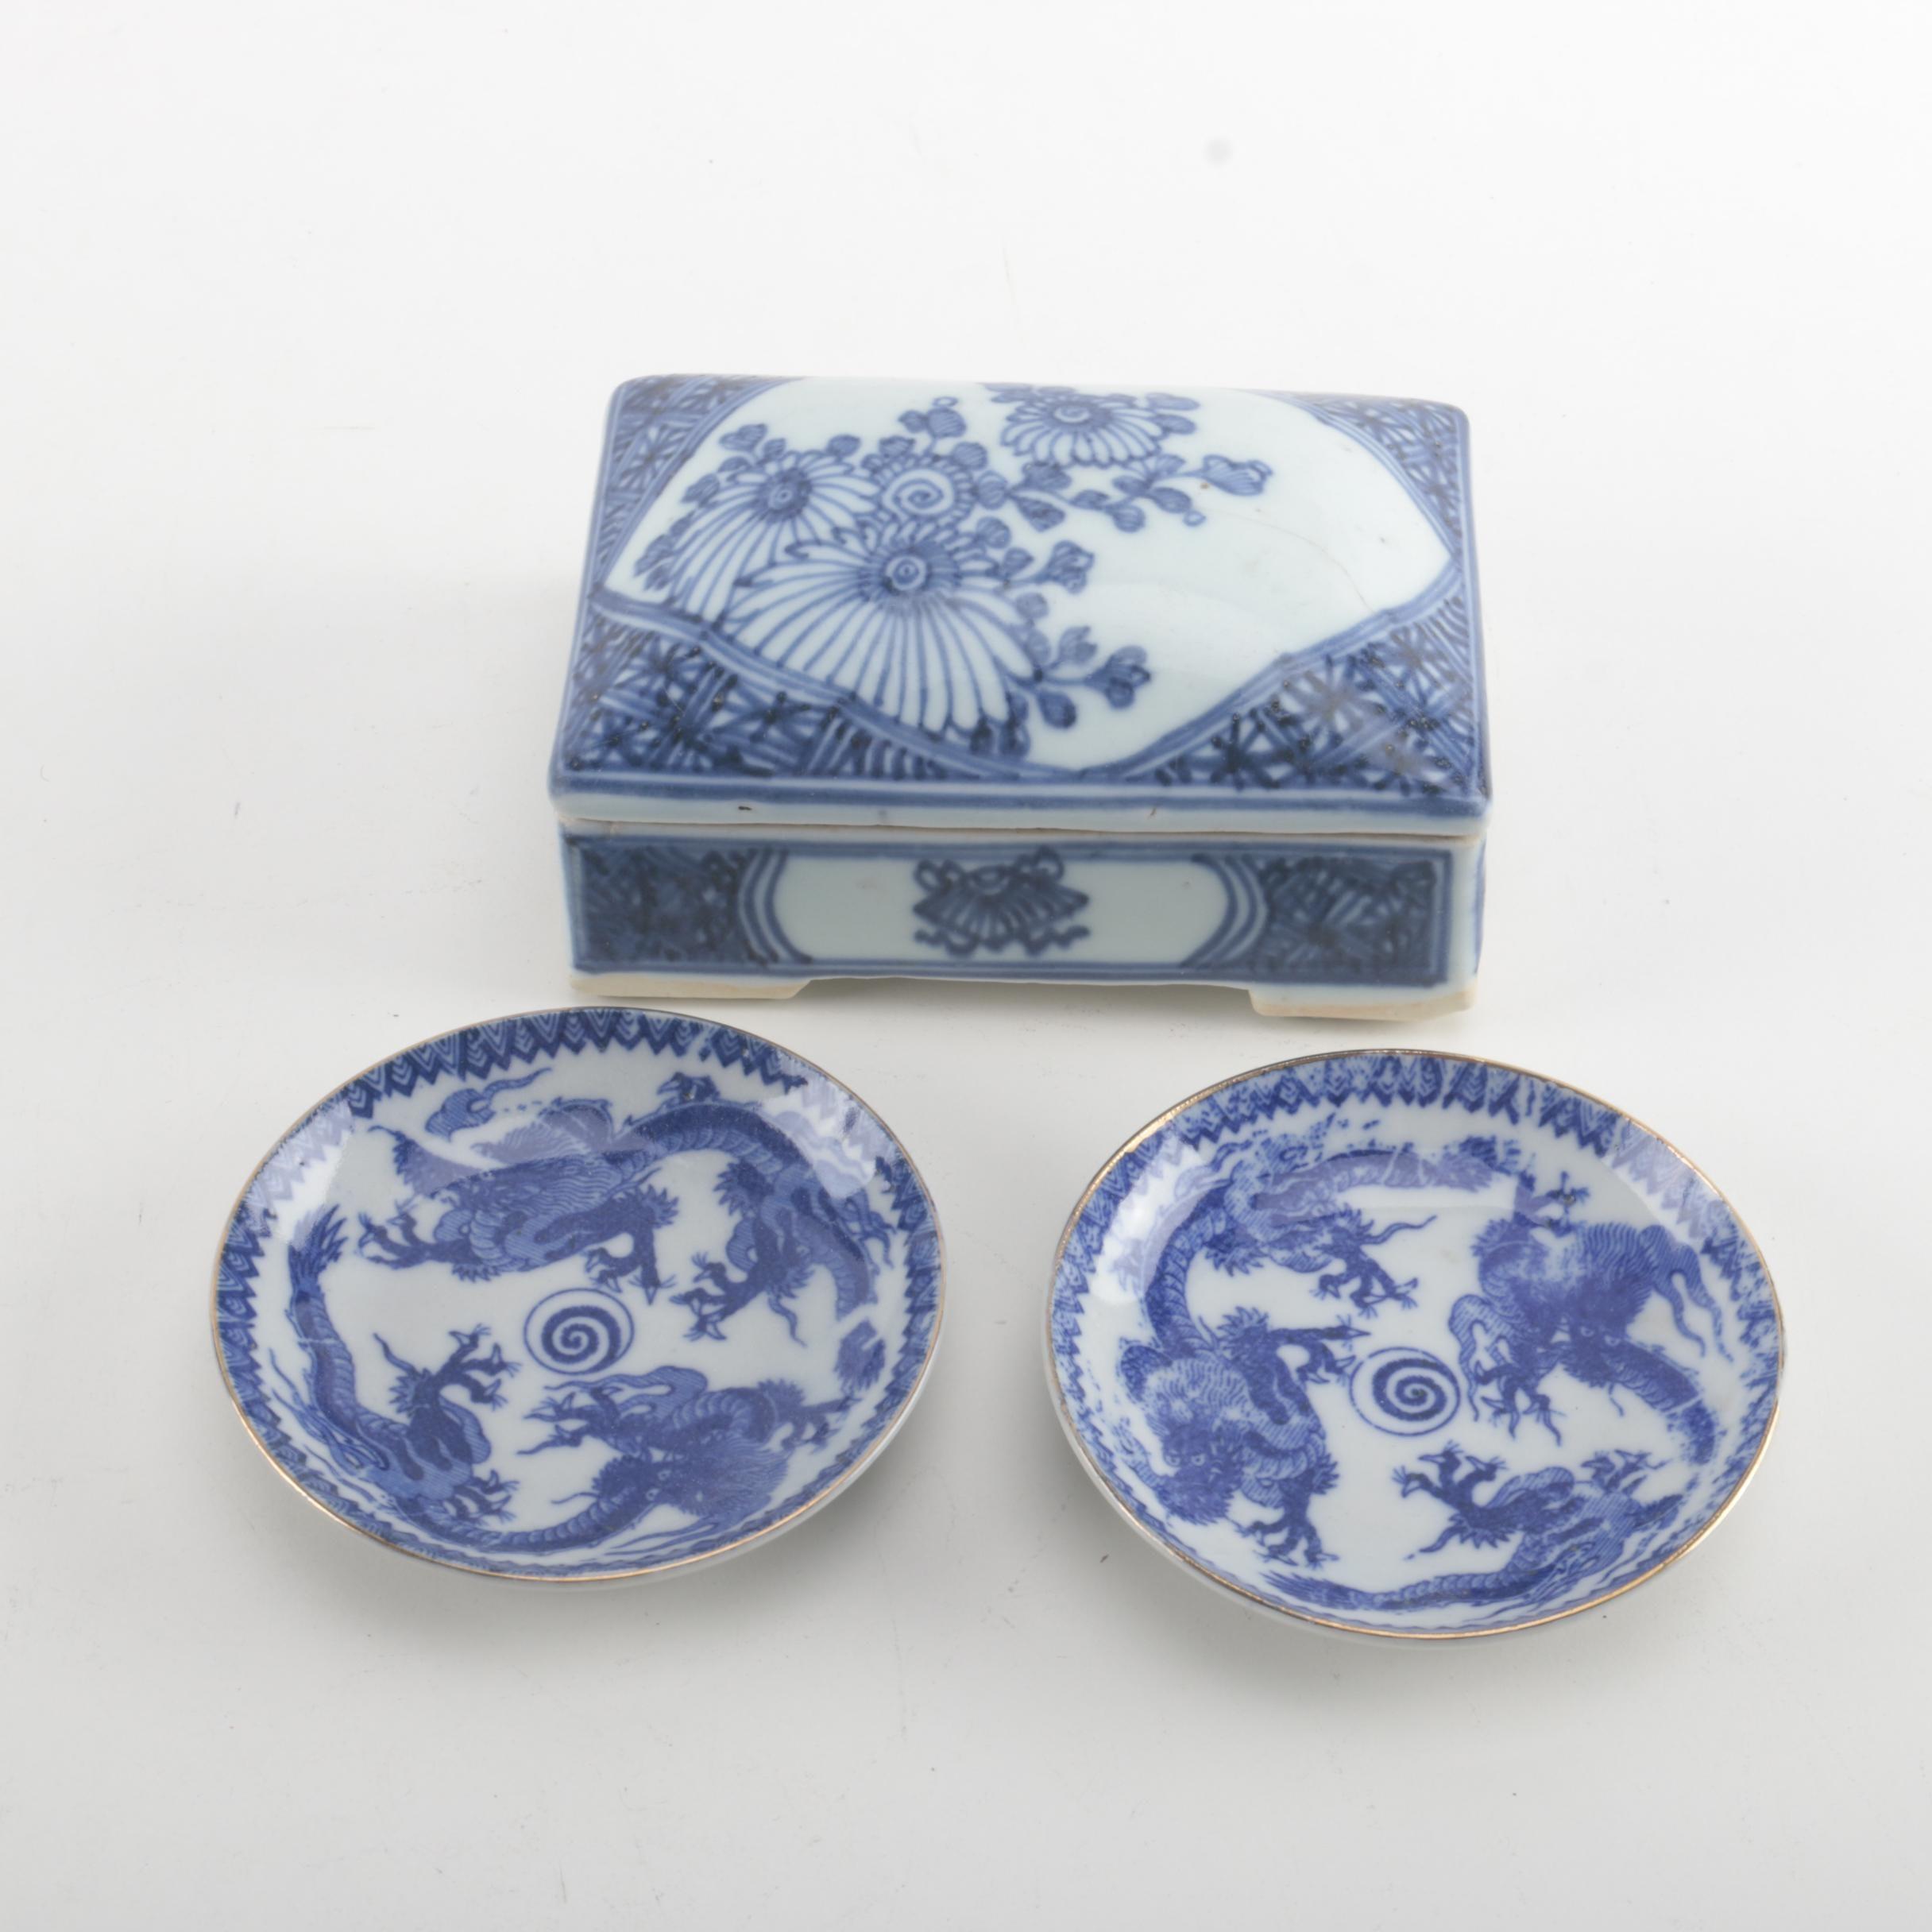 Trinket Box and Decorative Plates